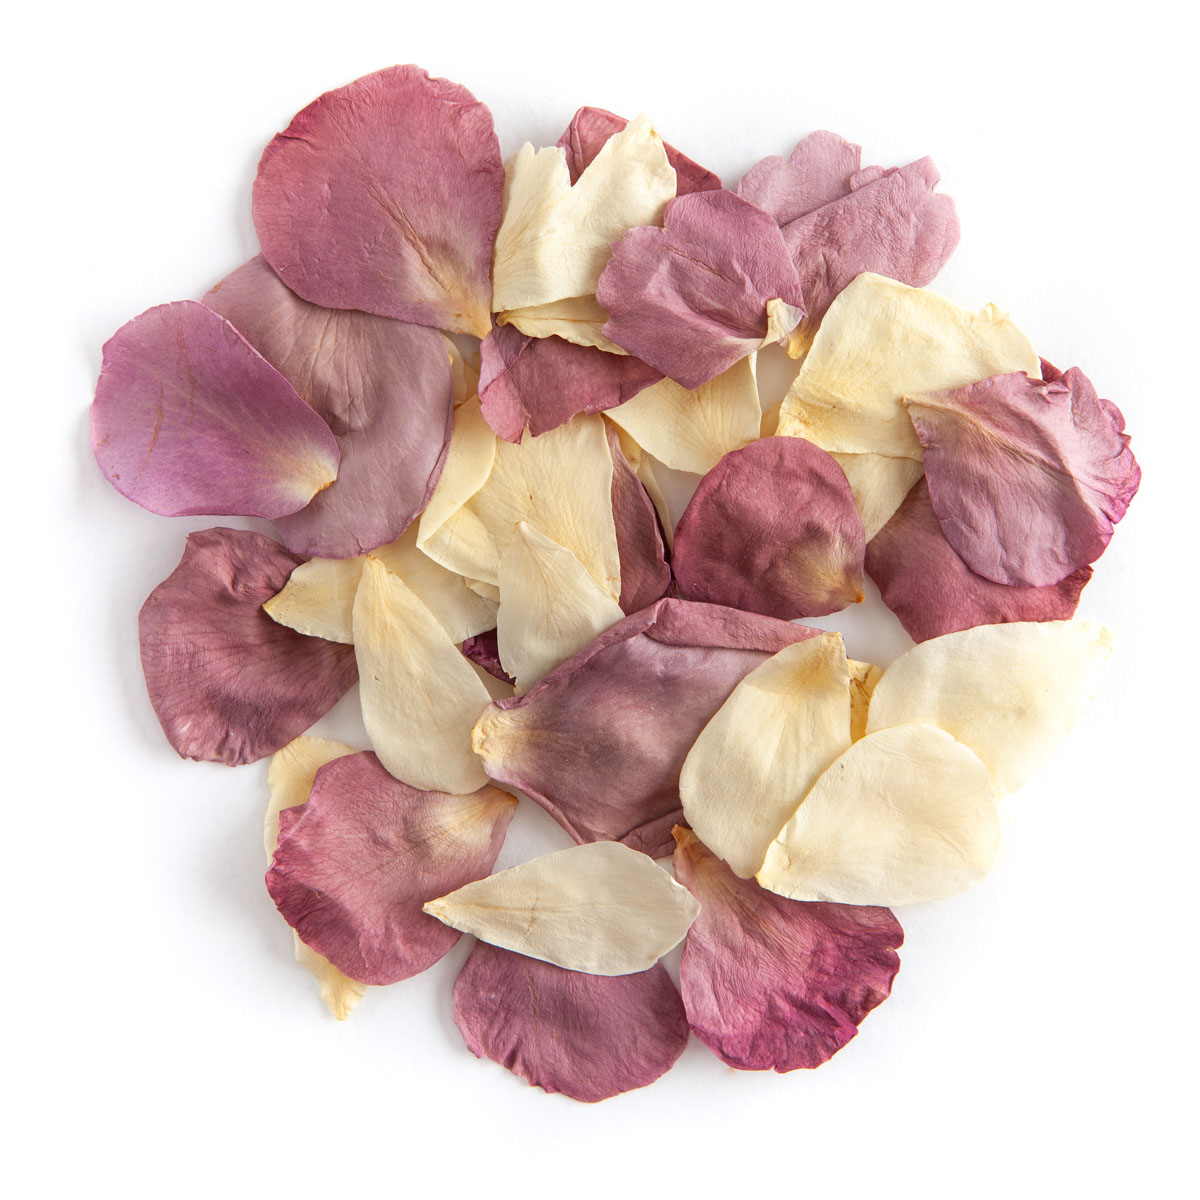 Lilac & Cream rose petals - Biodegradable Rose Petal Confetti - Real Flower Petal Confetti